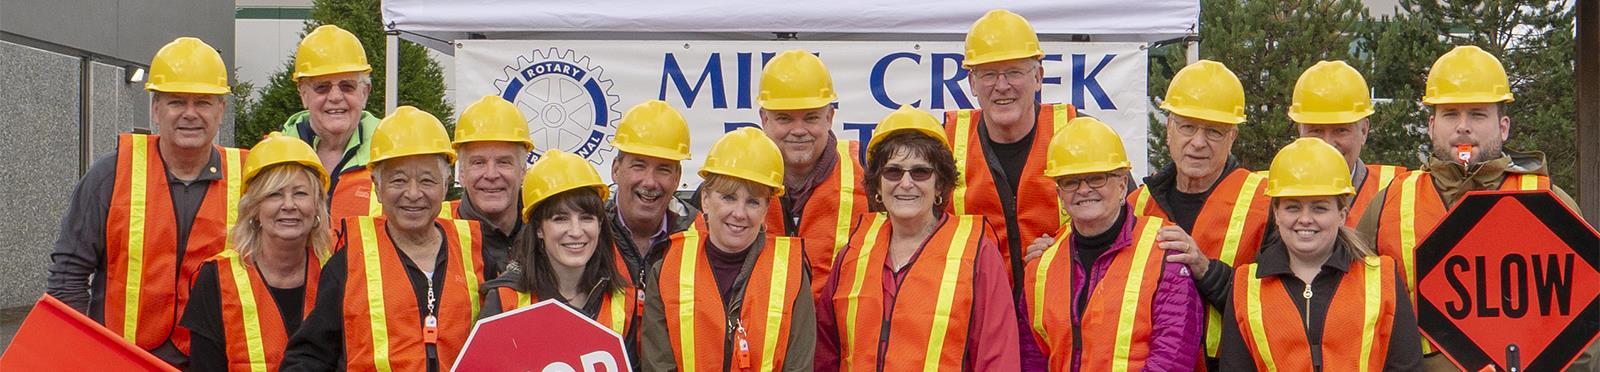 Stories | Rotary Club of Mill Creek